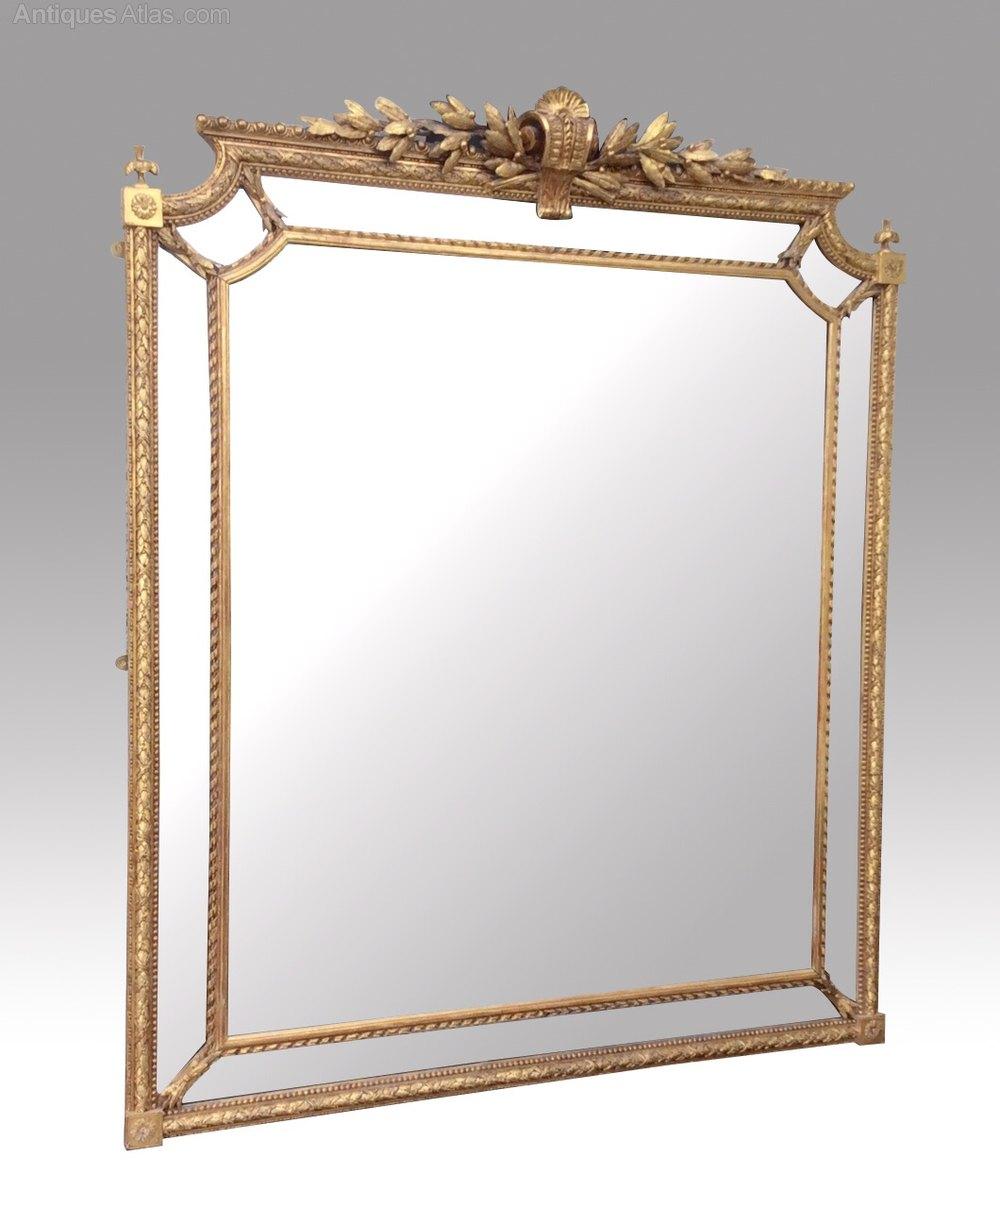 Antiques atlas superb antique gilt overmantle mirror for Overmantle mirror